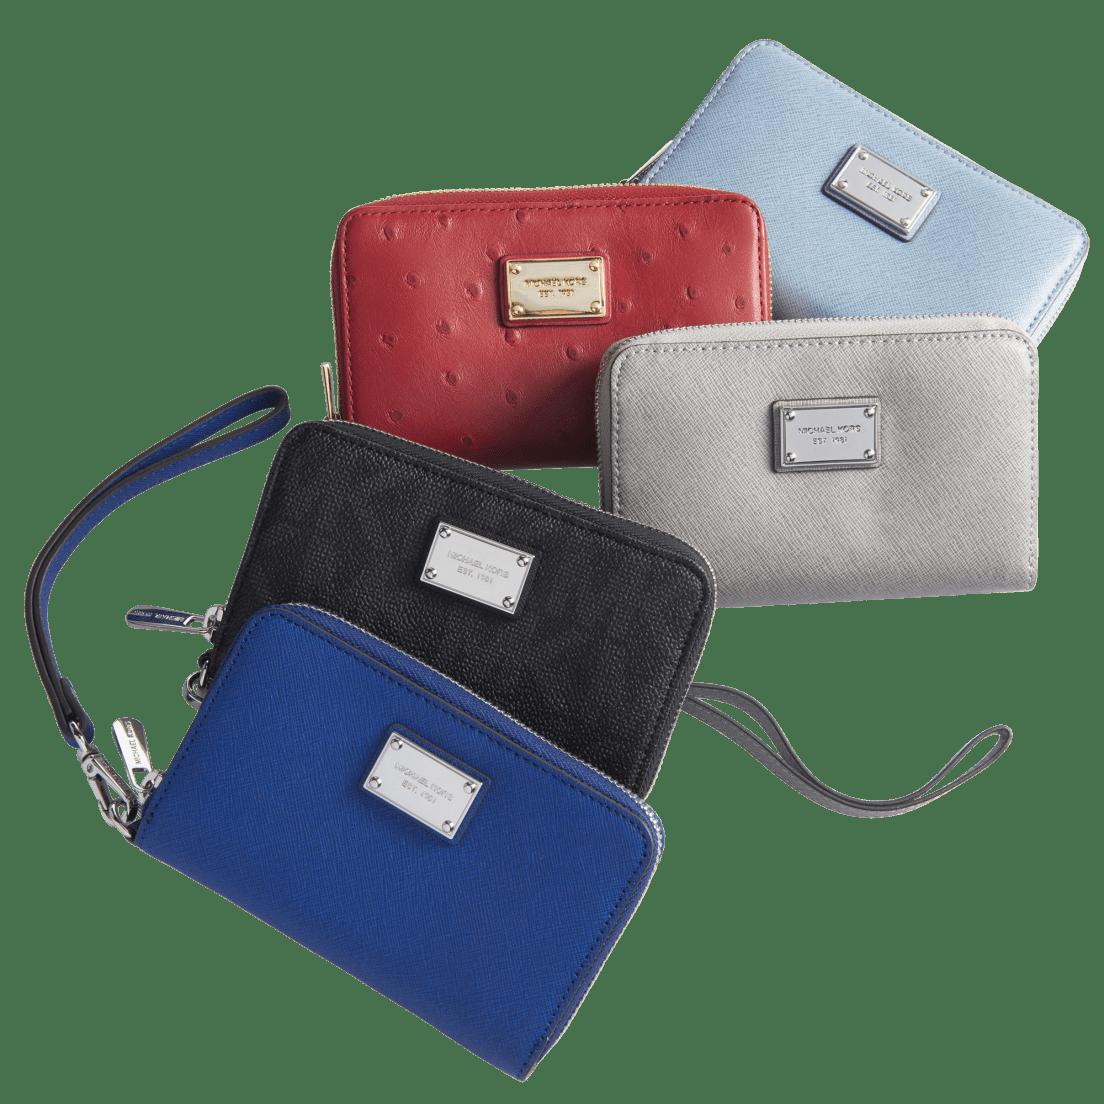 d0d800a60a29 Small Essential Zip Wallet by Michael Kors